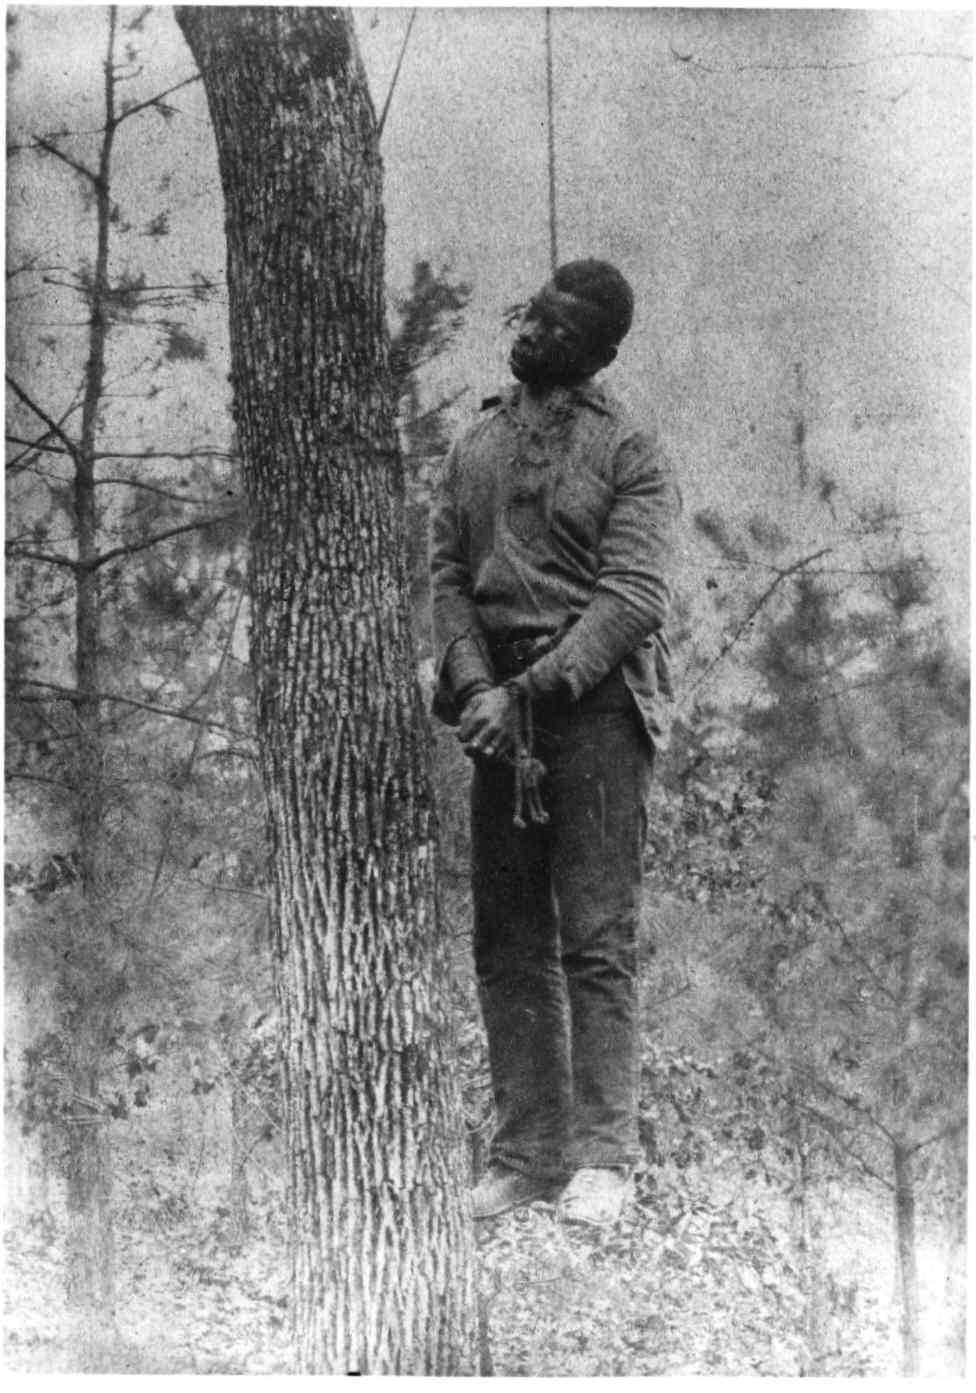 http://upload.wikimedia.org/wikipedia/commons/4/4d/Lynching-1889.jpg